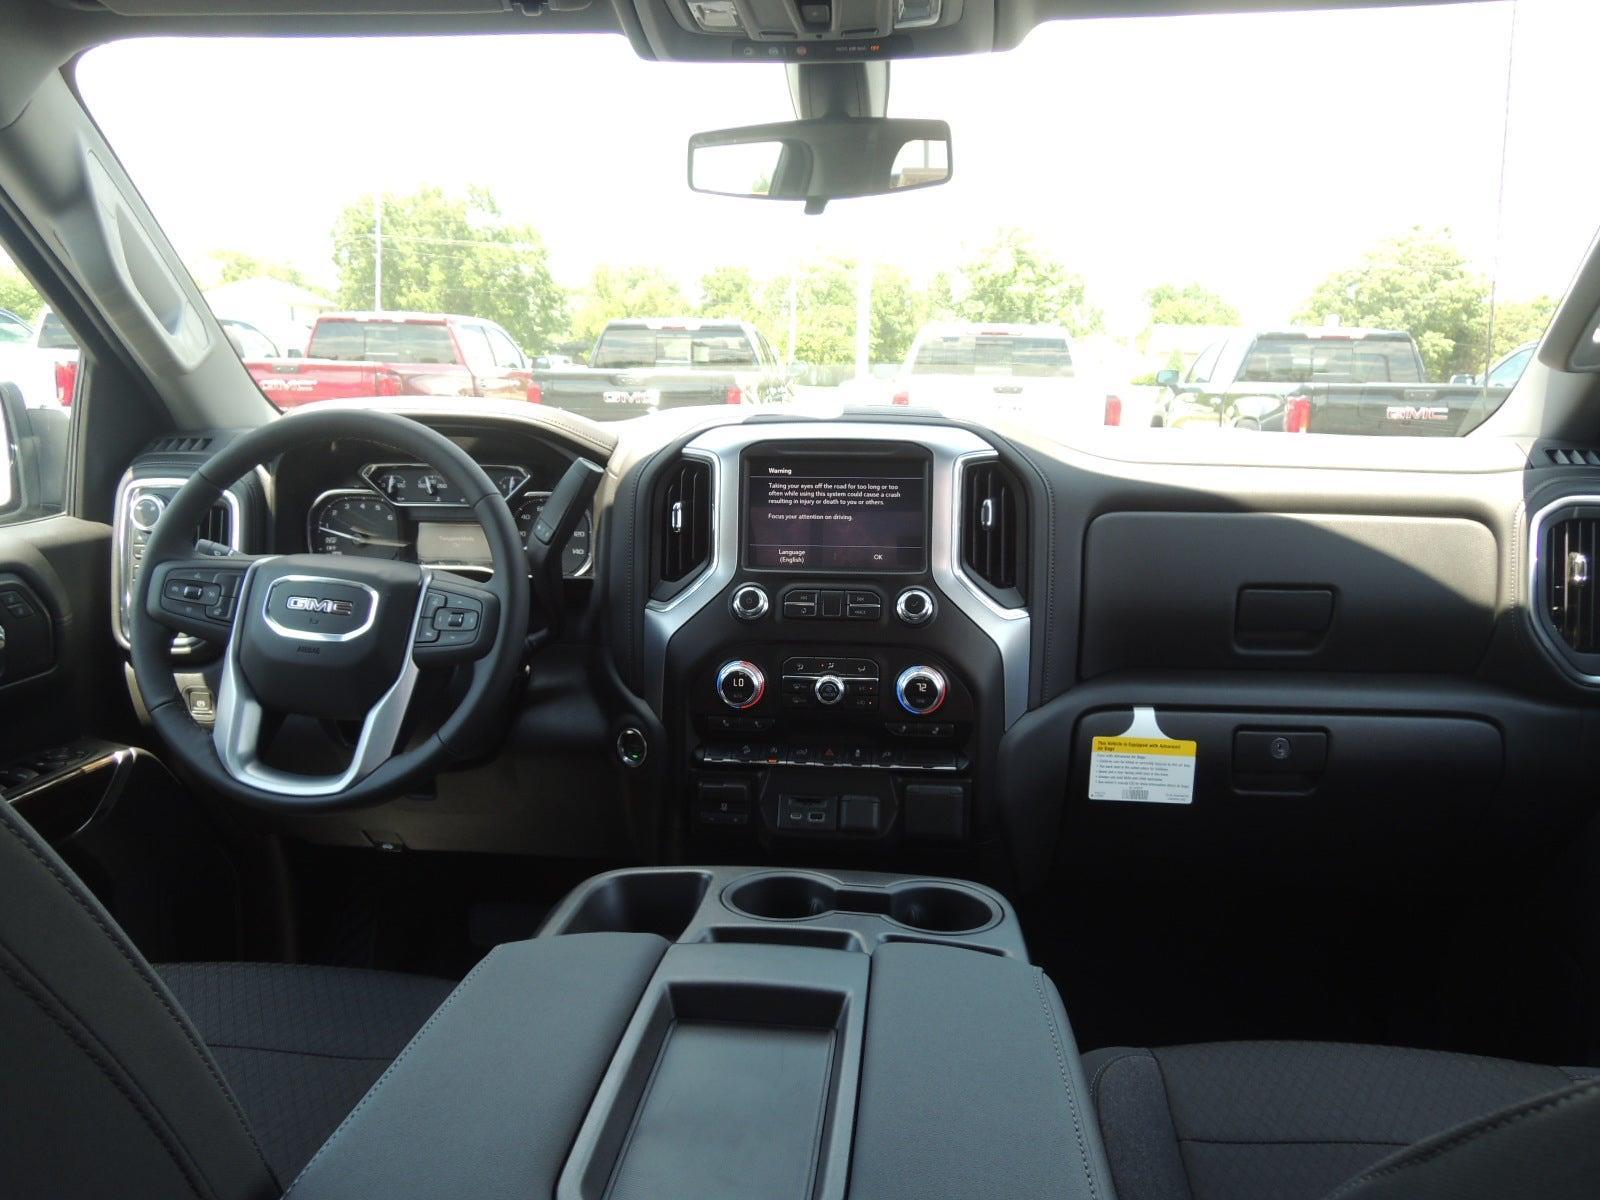 2021 GMC Sierra 1500 Crew Cab 4x4, Pickup #MT735 - photo 12